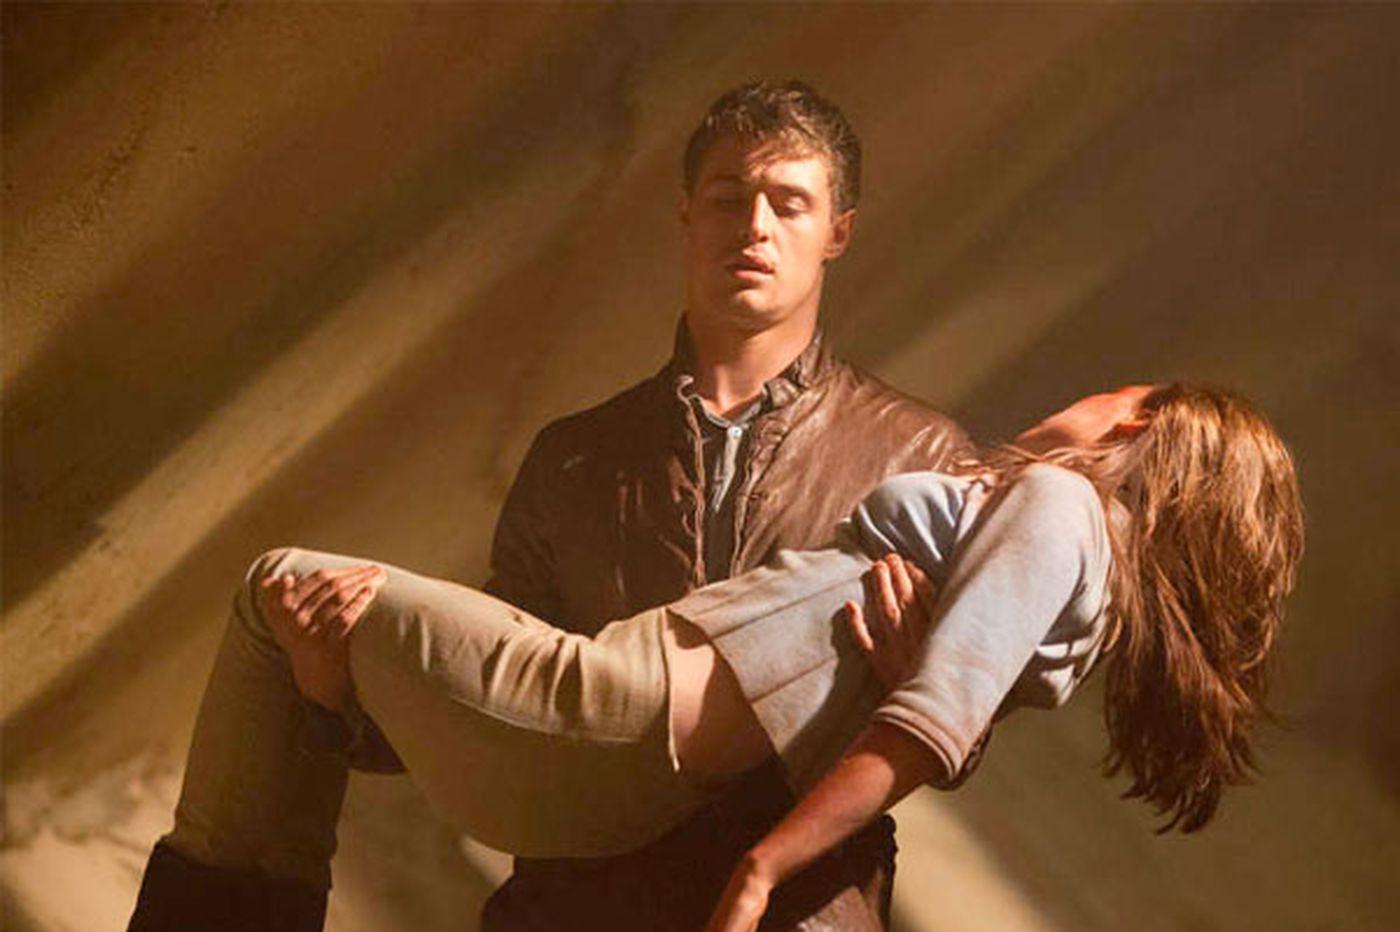 'The Host': Sci-fi romance lacks energy, passion